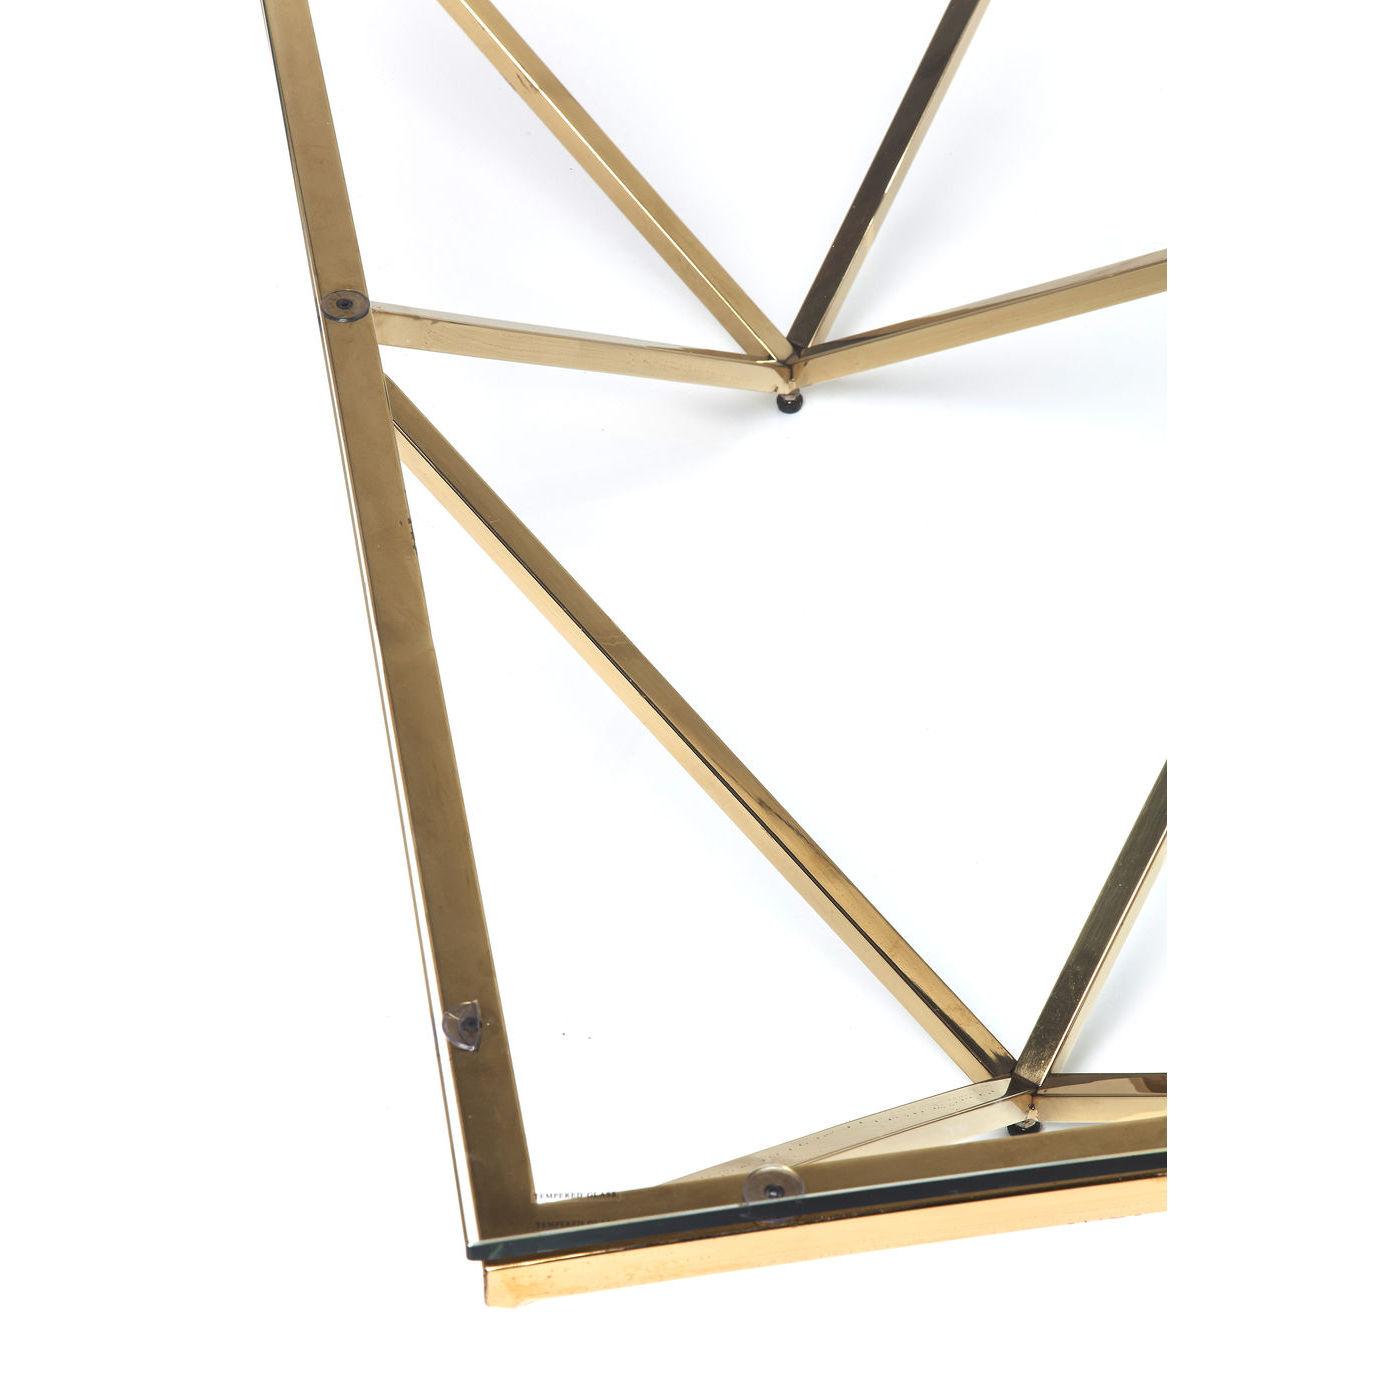 KARE DESIGN Network Gold sofabord - klart glas/guld stål (105x105)